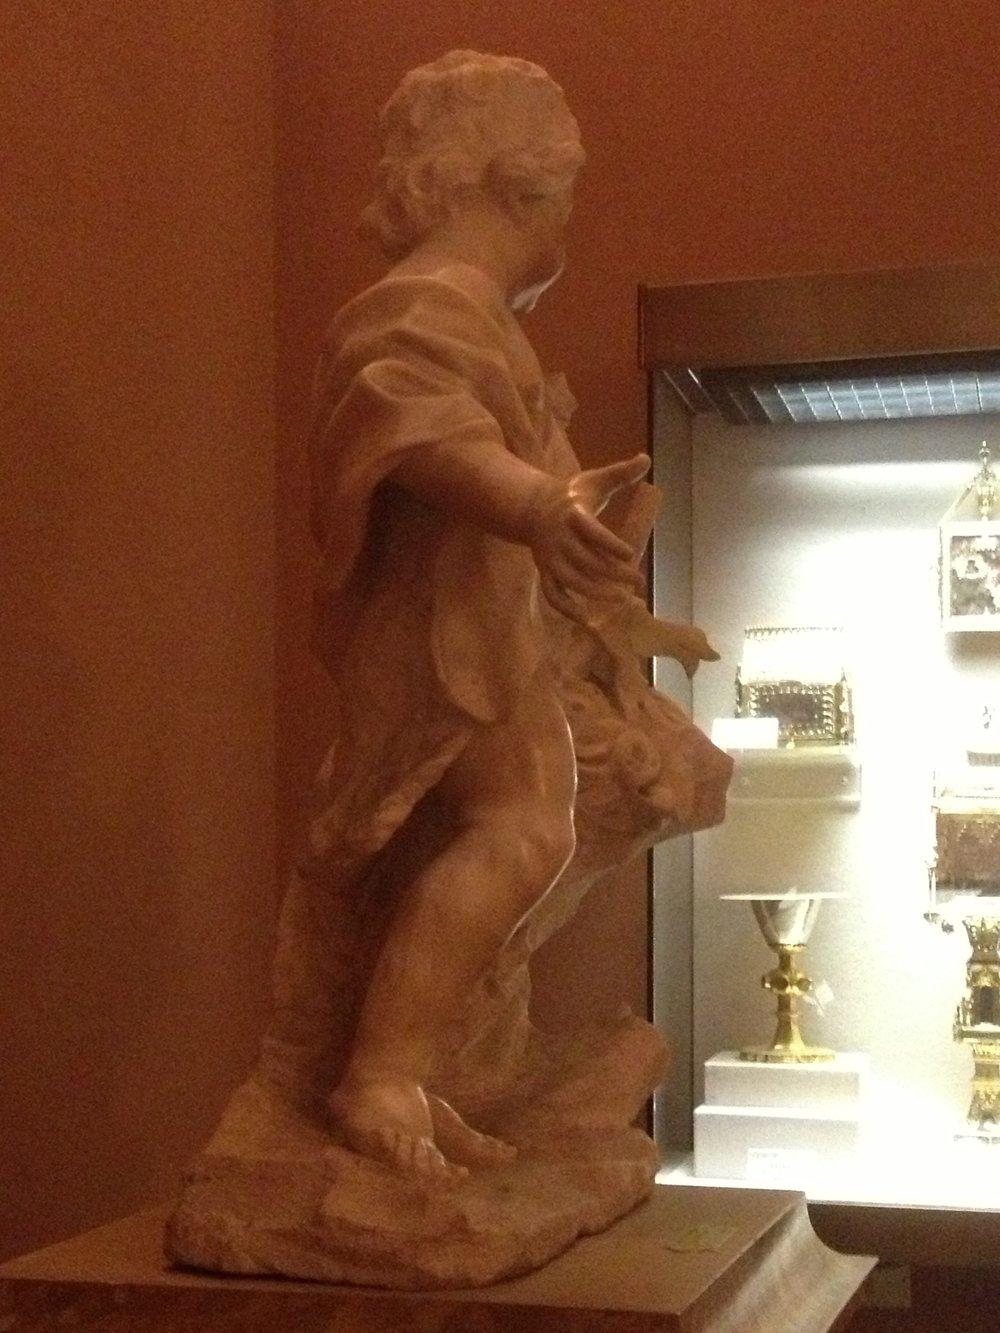 Pseudoithyphallic-iconography-statues-jessewaugh.com-5.jpg